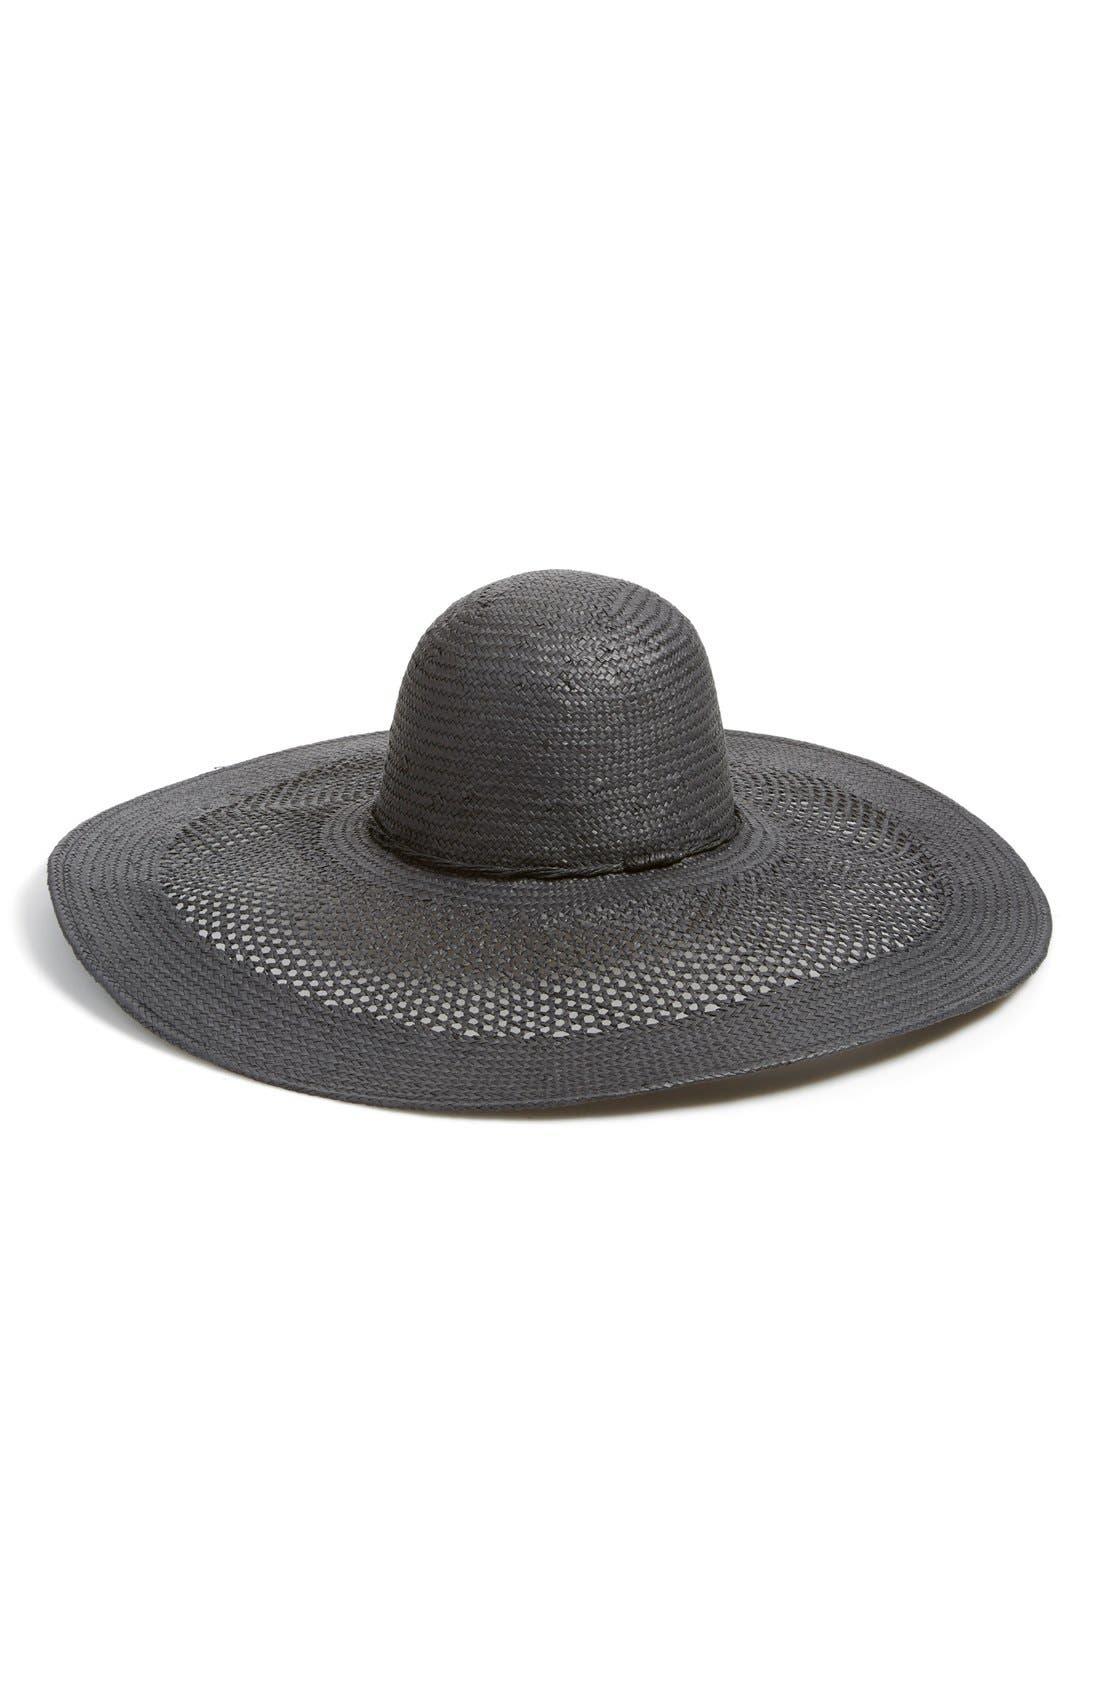 Main Image - Phase 3 Open Weave Floppy Straw Hat